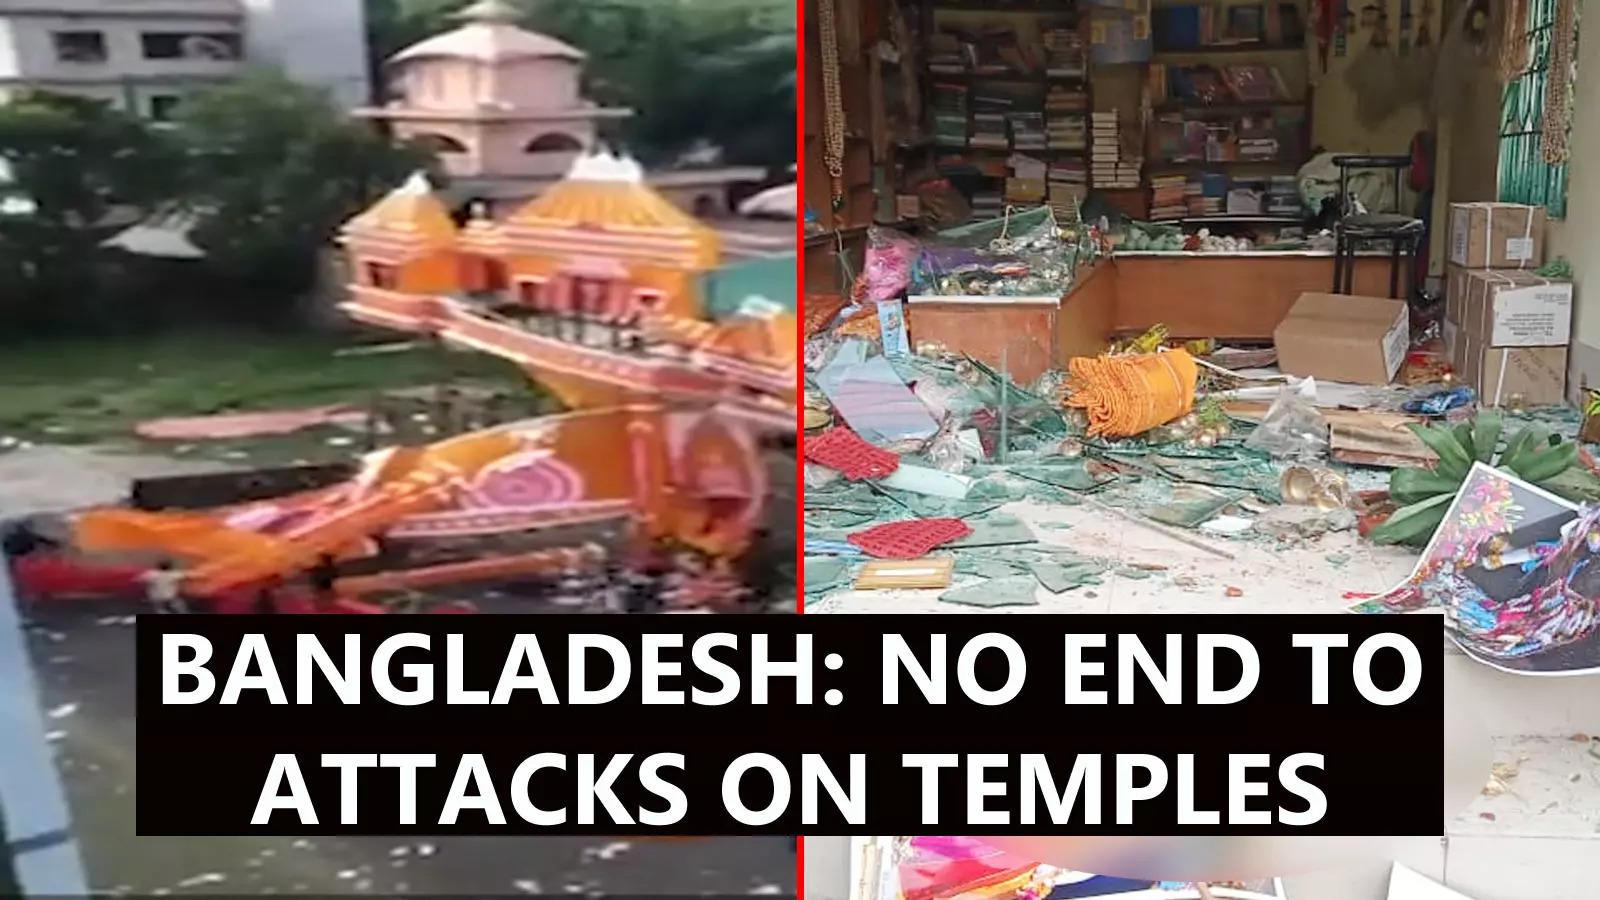 anti-hindu-violence-in-bangladesh-after-attack-on-noakhali-temple-iskcon-asks-pm-modi-to-talk-to-hasina